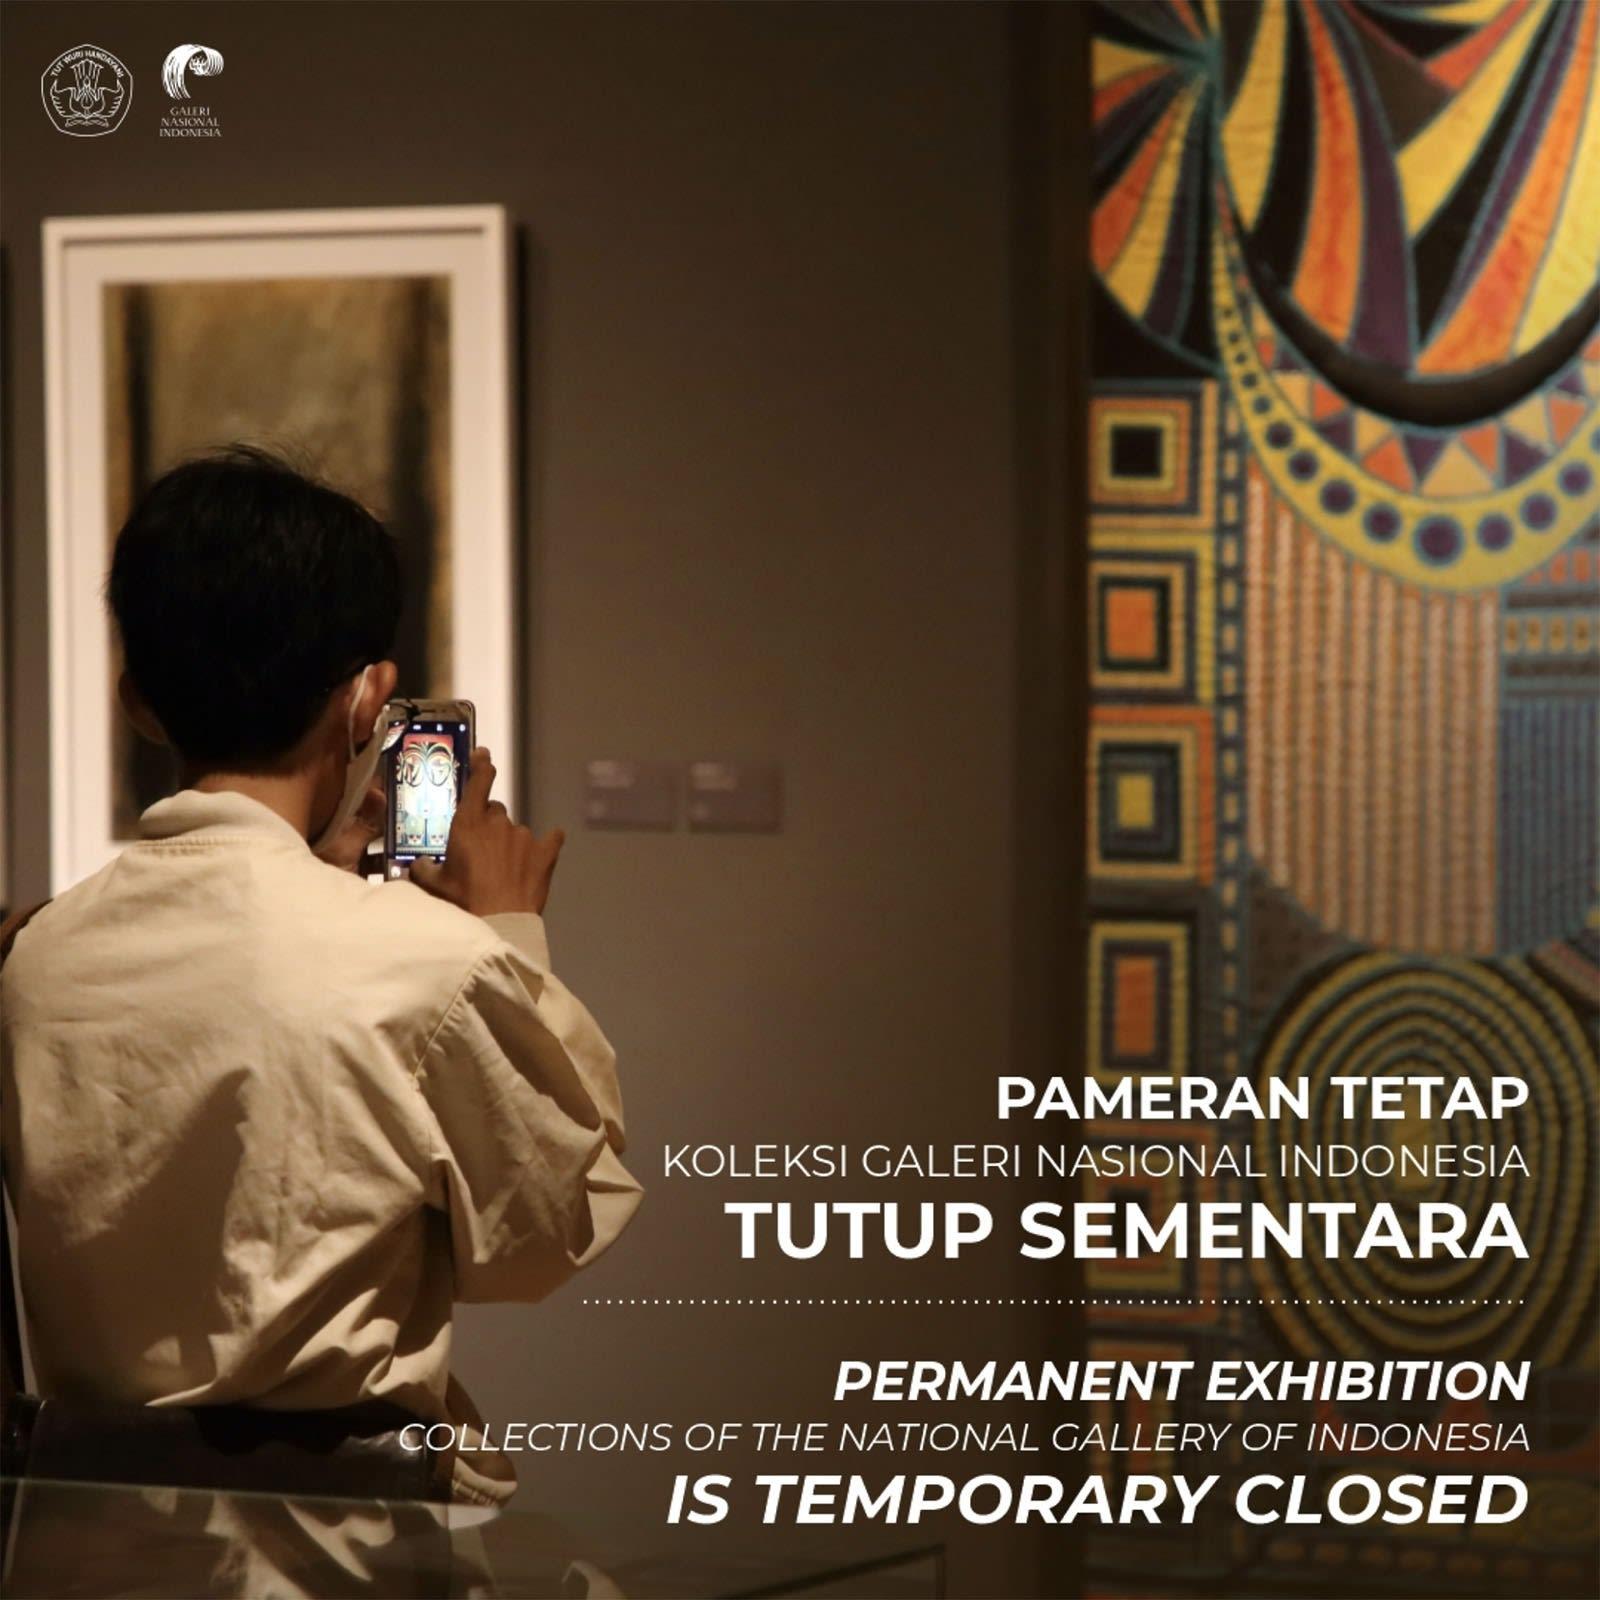 Photo: Galeri Nasional Indonesia